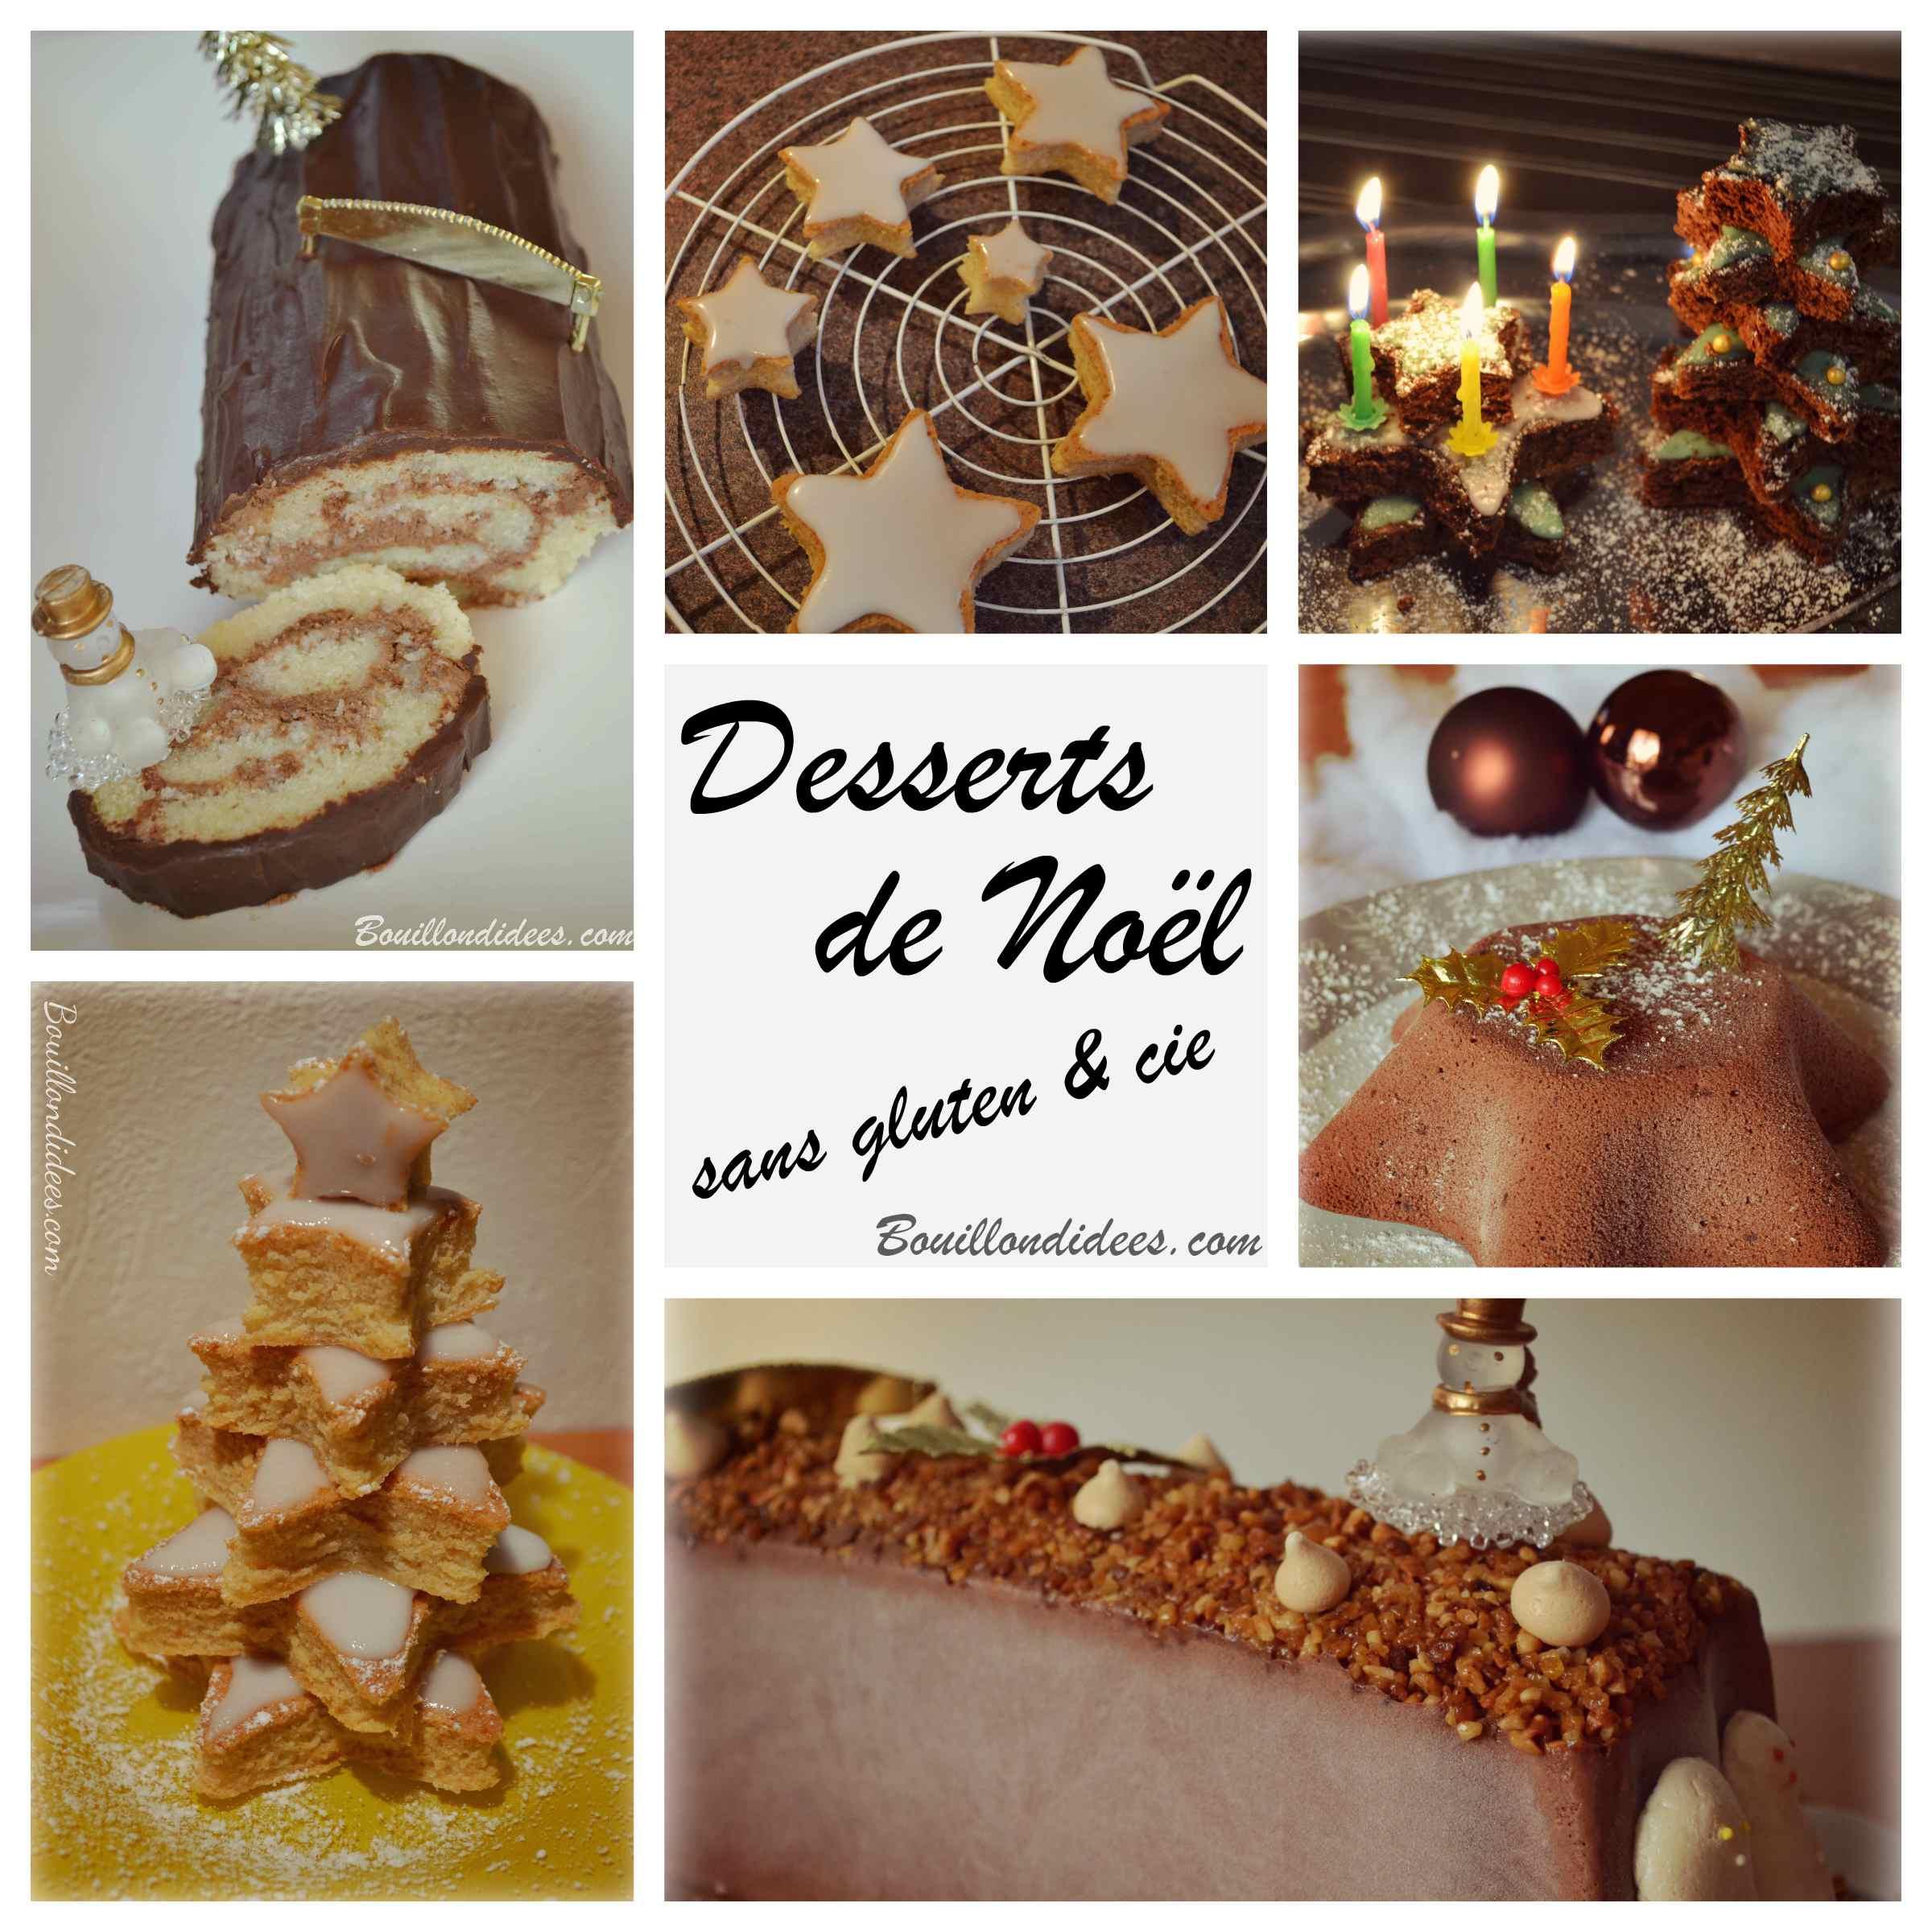 Sucr archives bouillon d 39 id es - Dessert vegan sans gluten ...